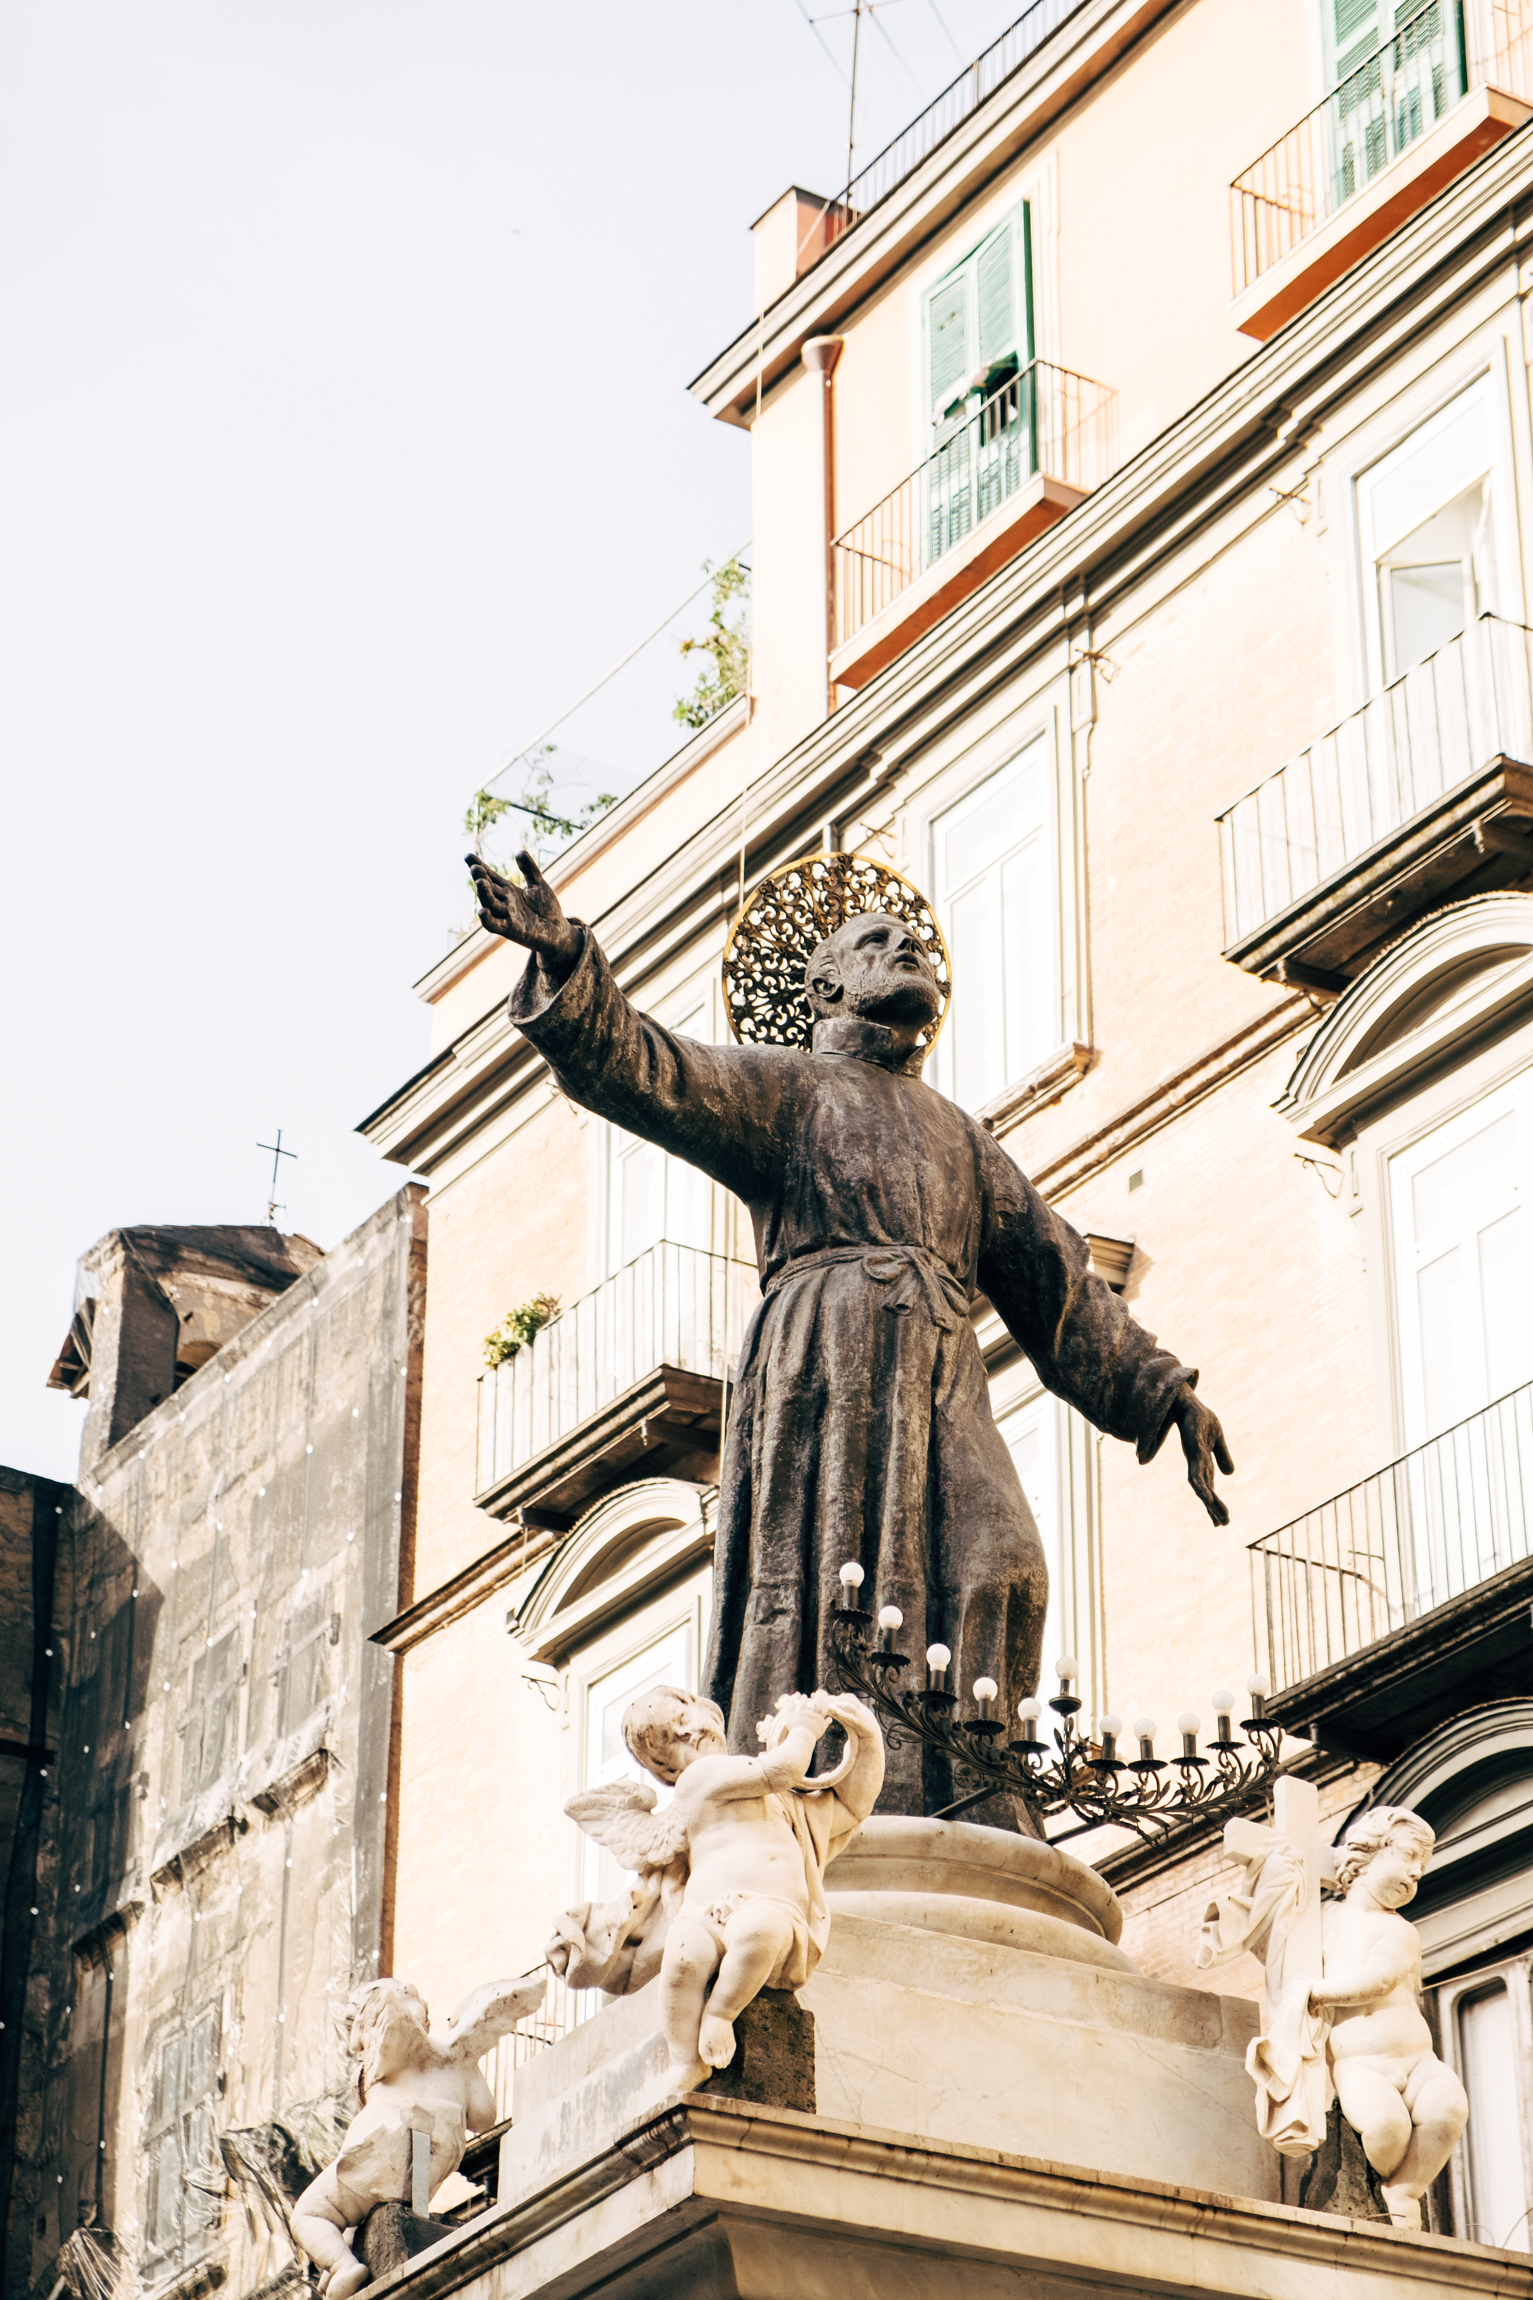 Statue of San Gaetano, one of the patron saints of Naples